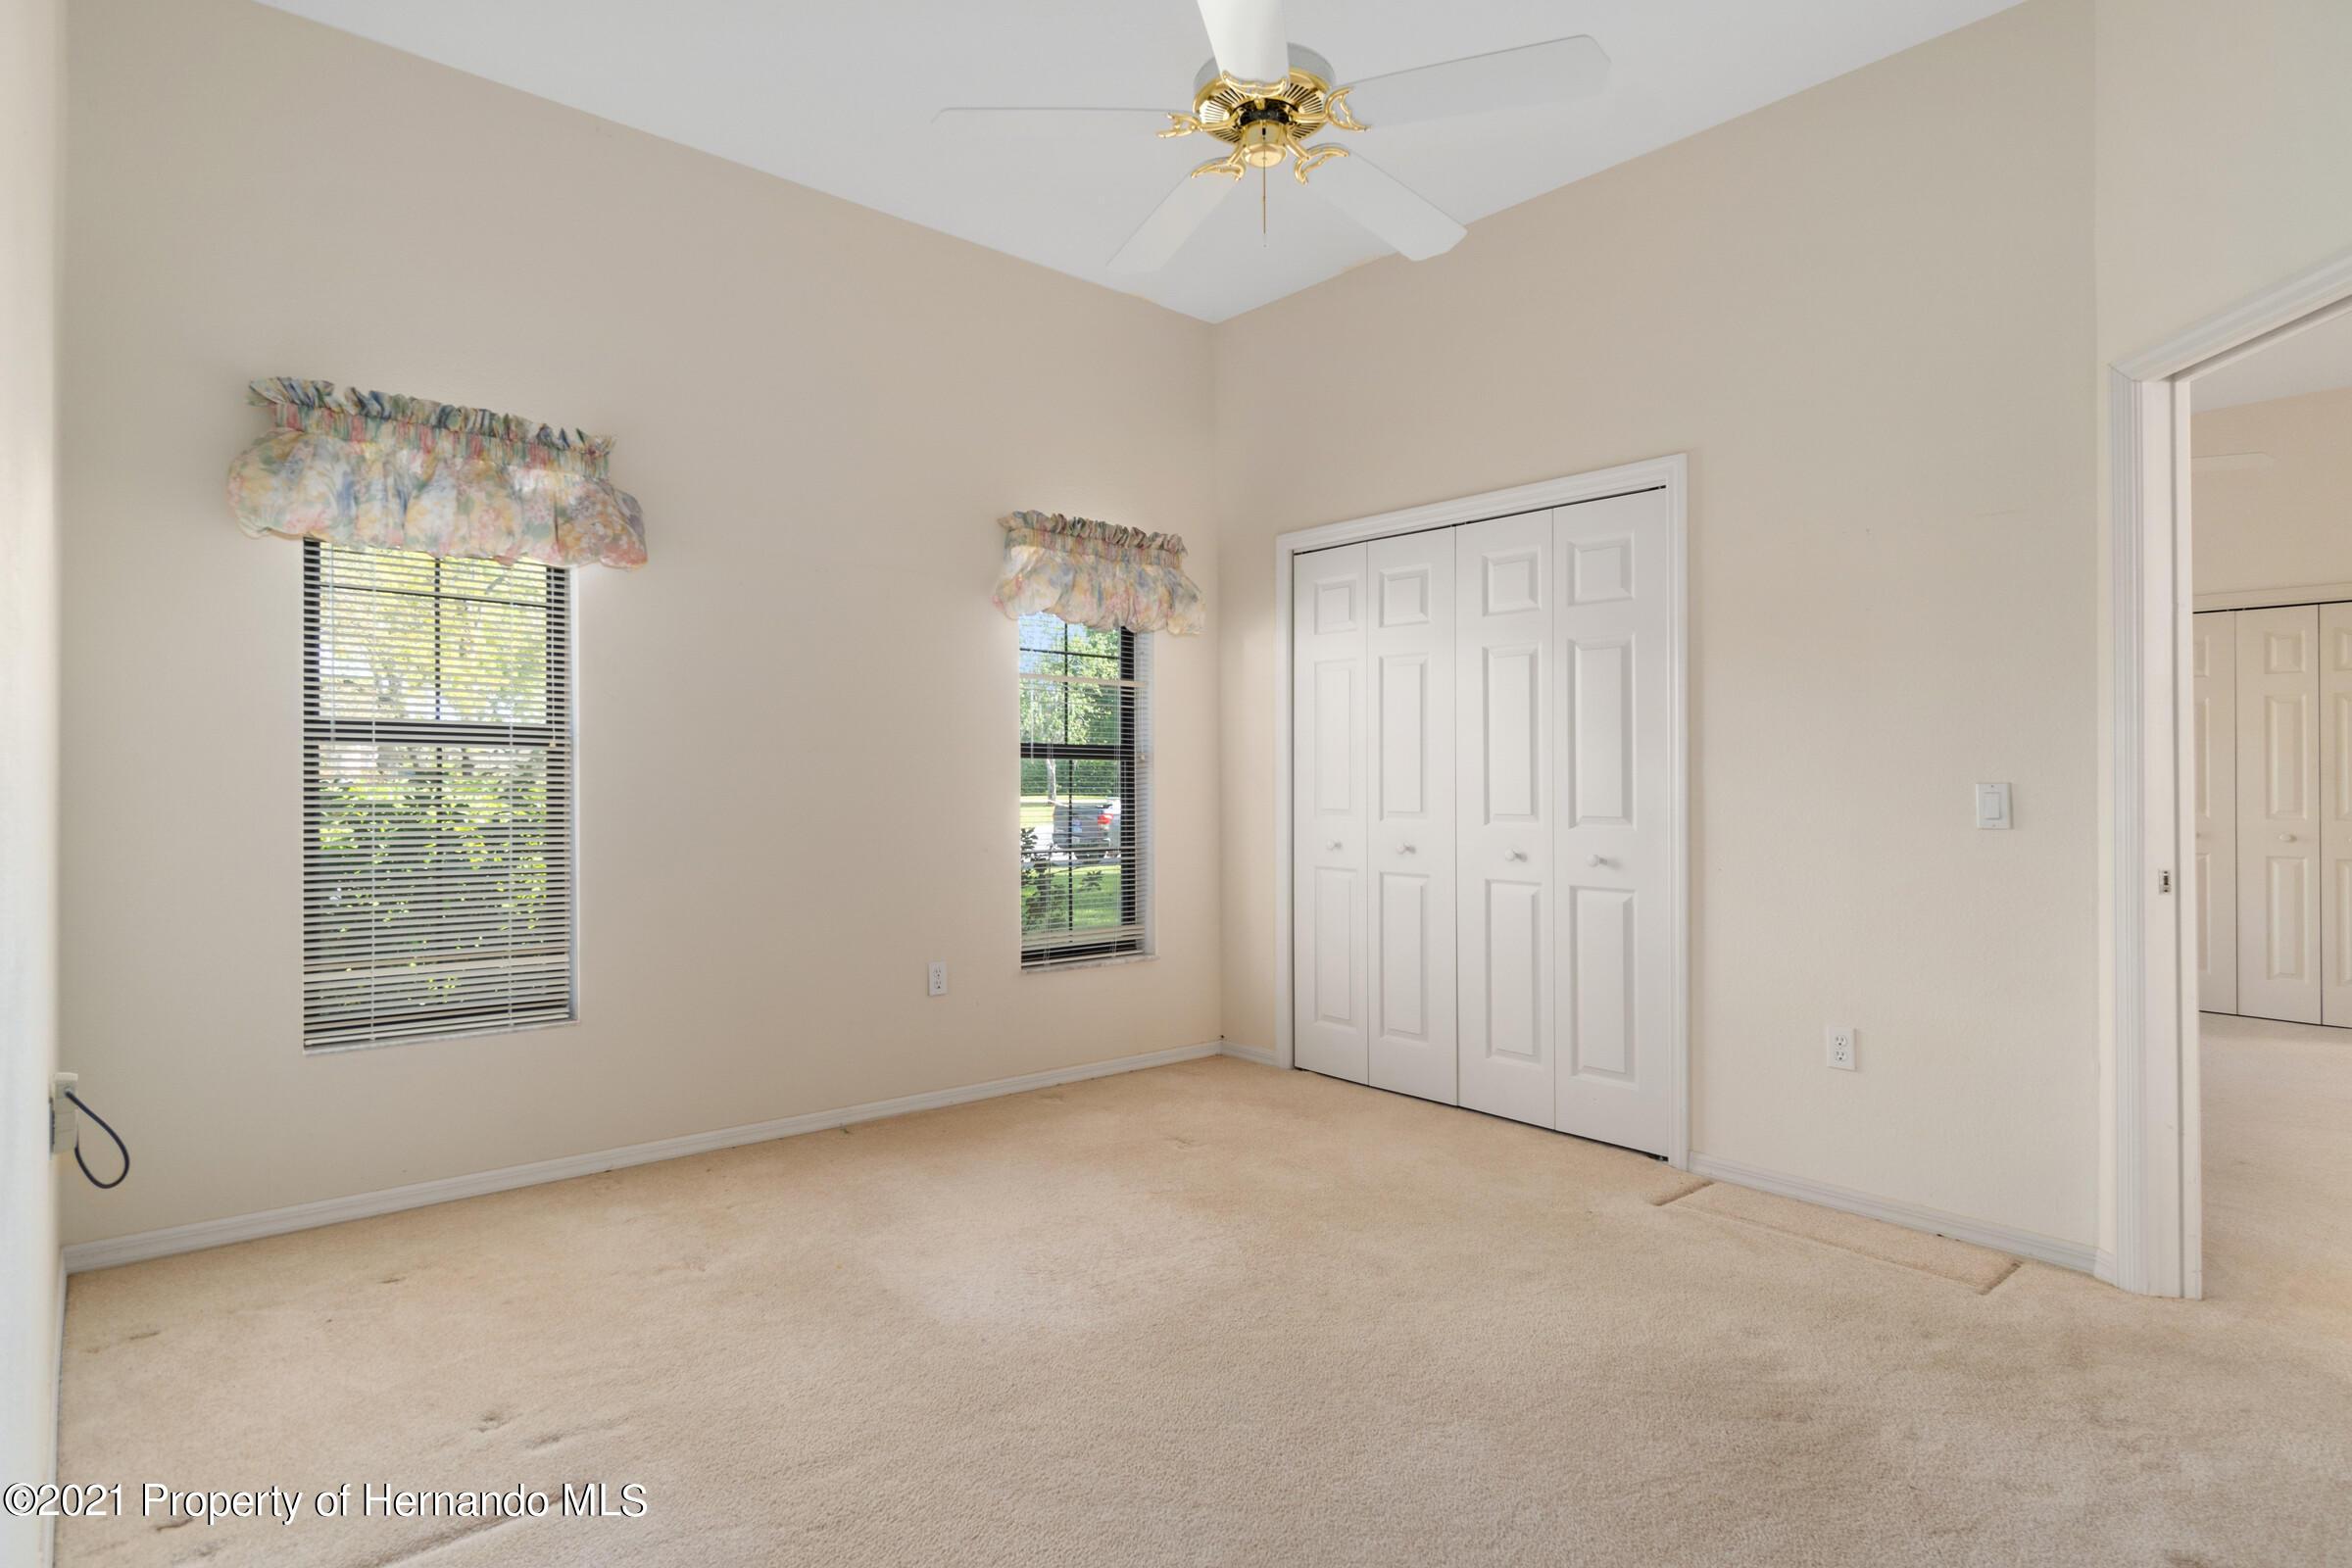 Image 27 For 10040 Twelve Oaks Court